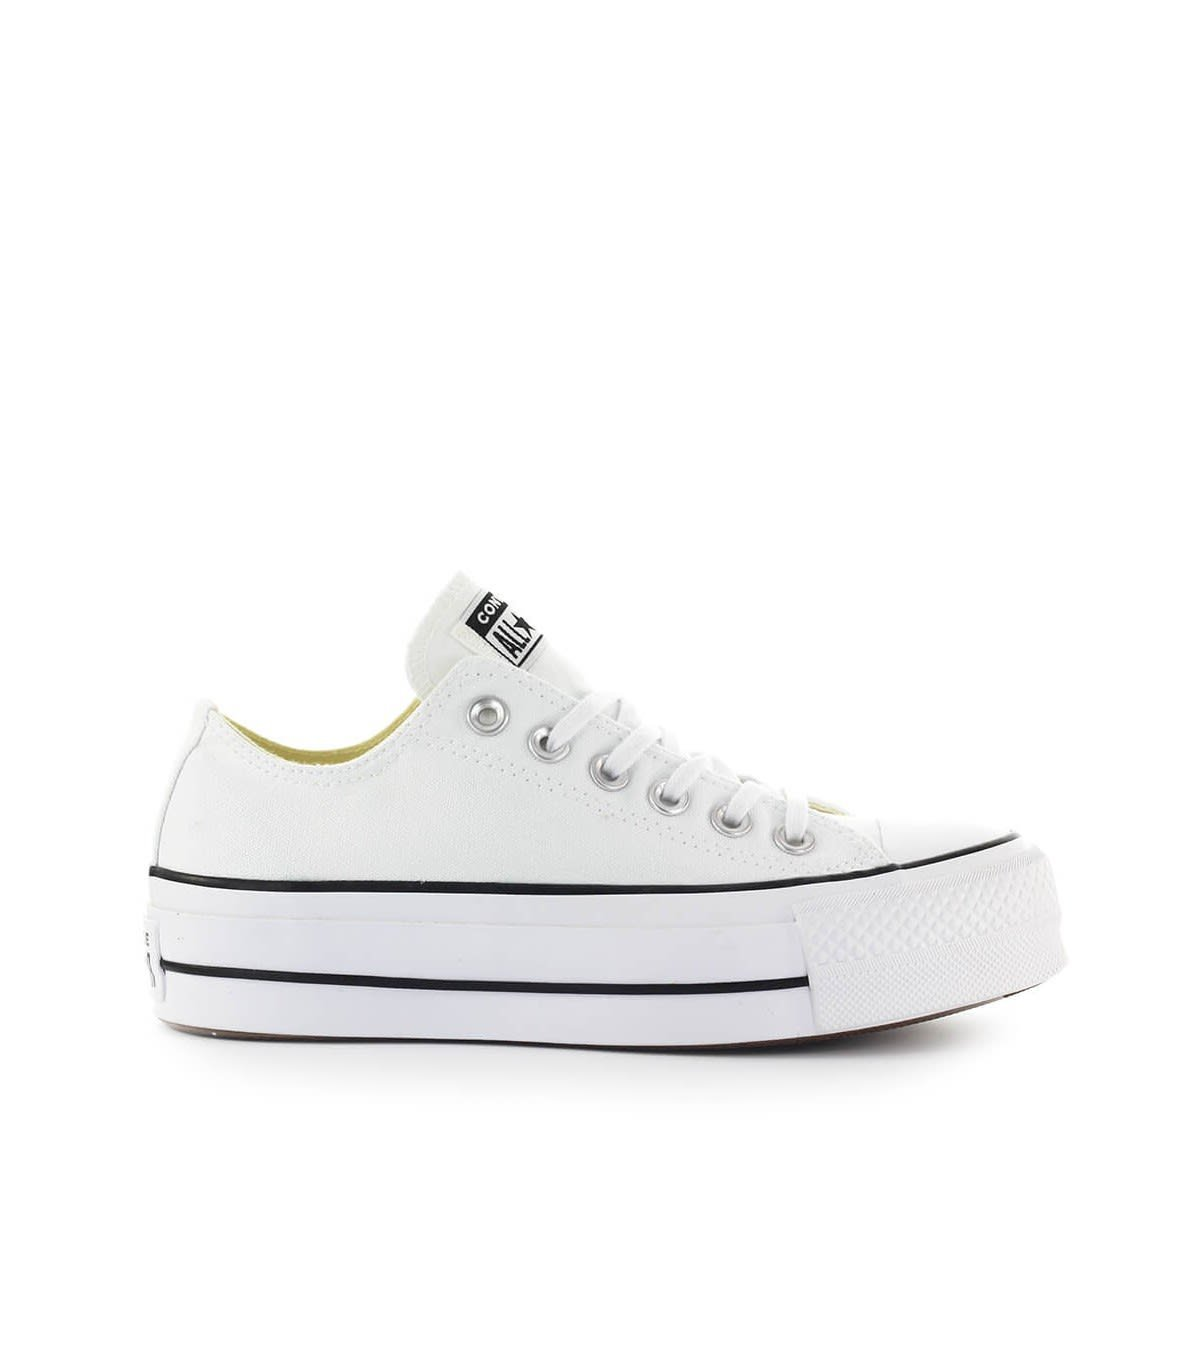 Converse All Star Chuck Taylor White Platform Sneaker